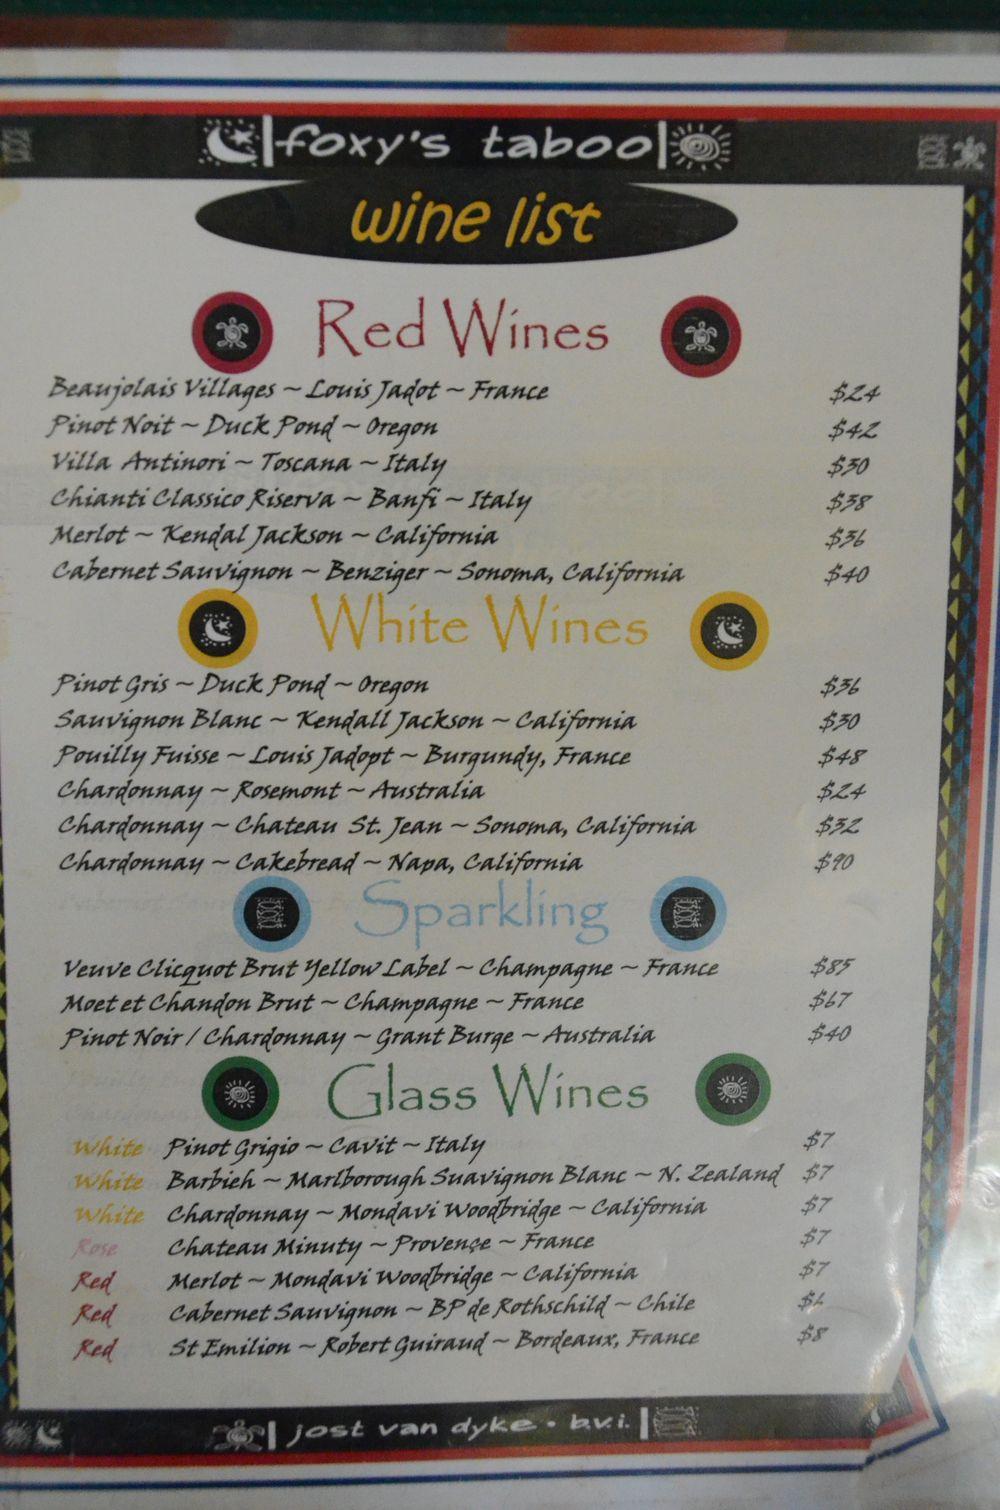 Foxy's Taboo Wine List.jpg